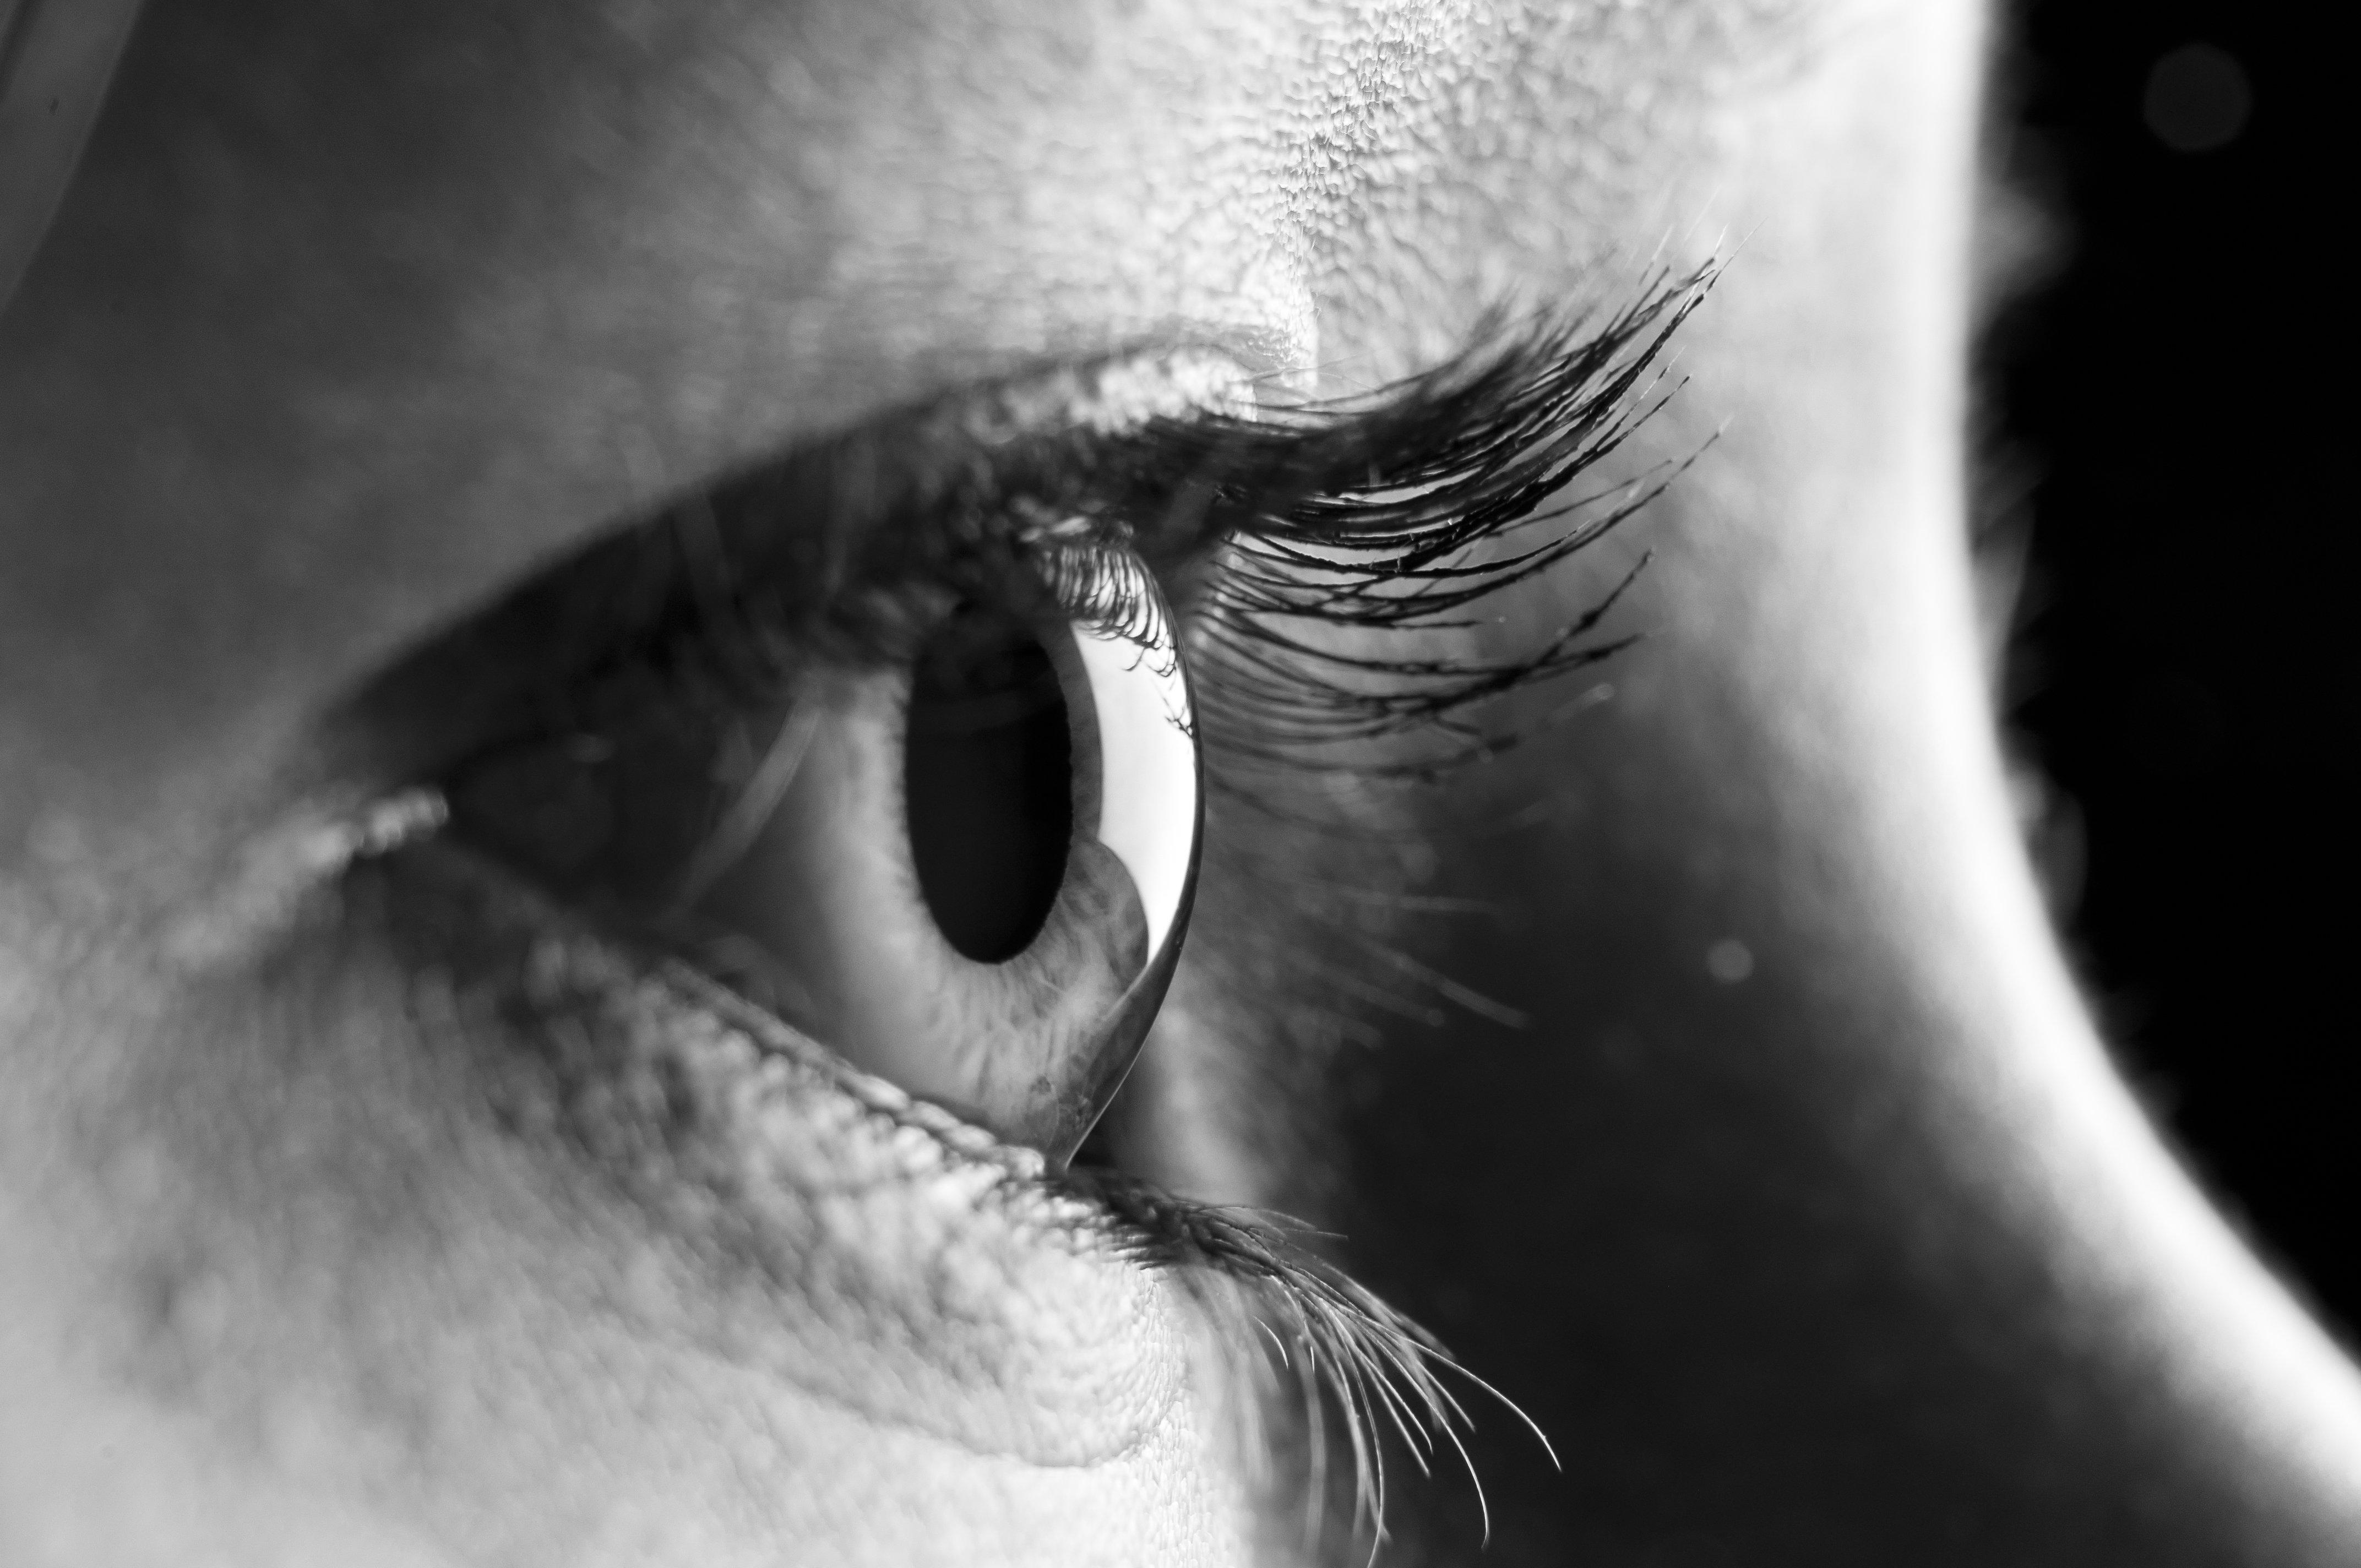 Eyes_Image.jpg